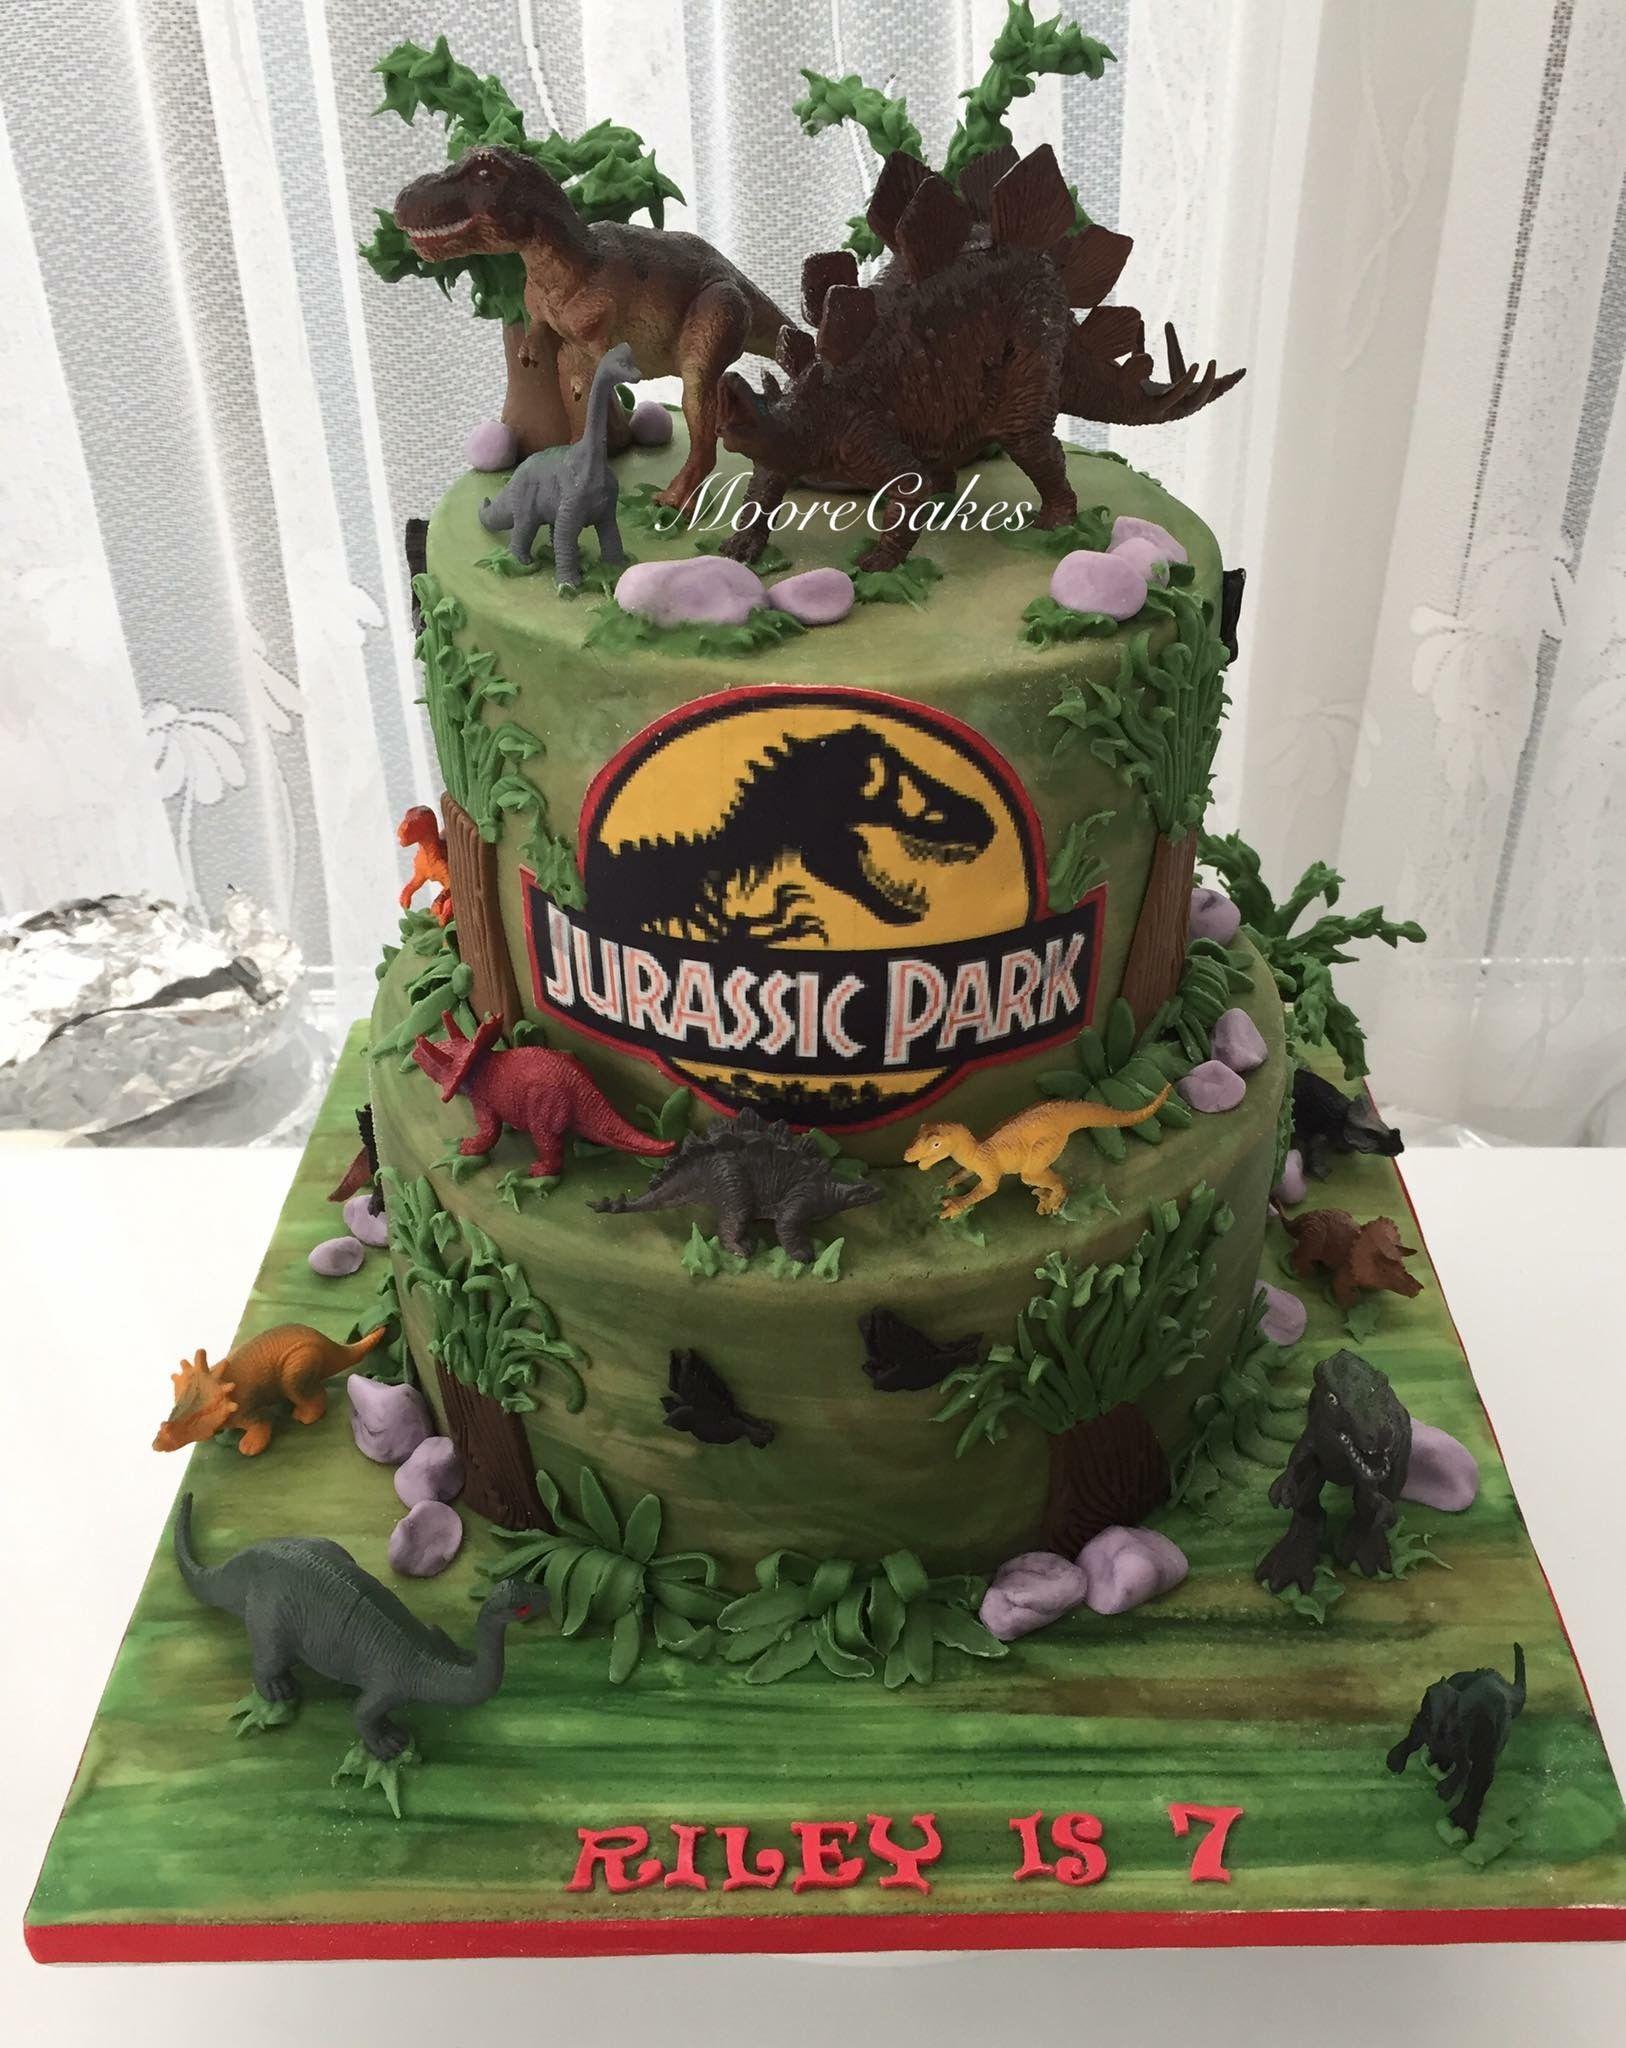 Jurassic Park Dinosaur Cake With Images Jurassic Park Birthday